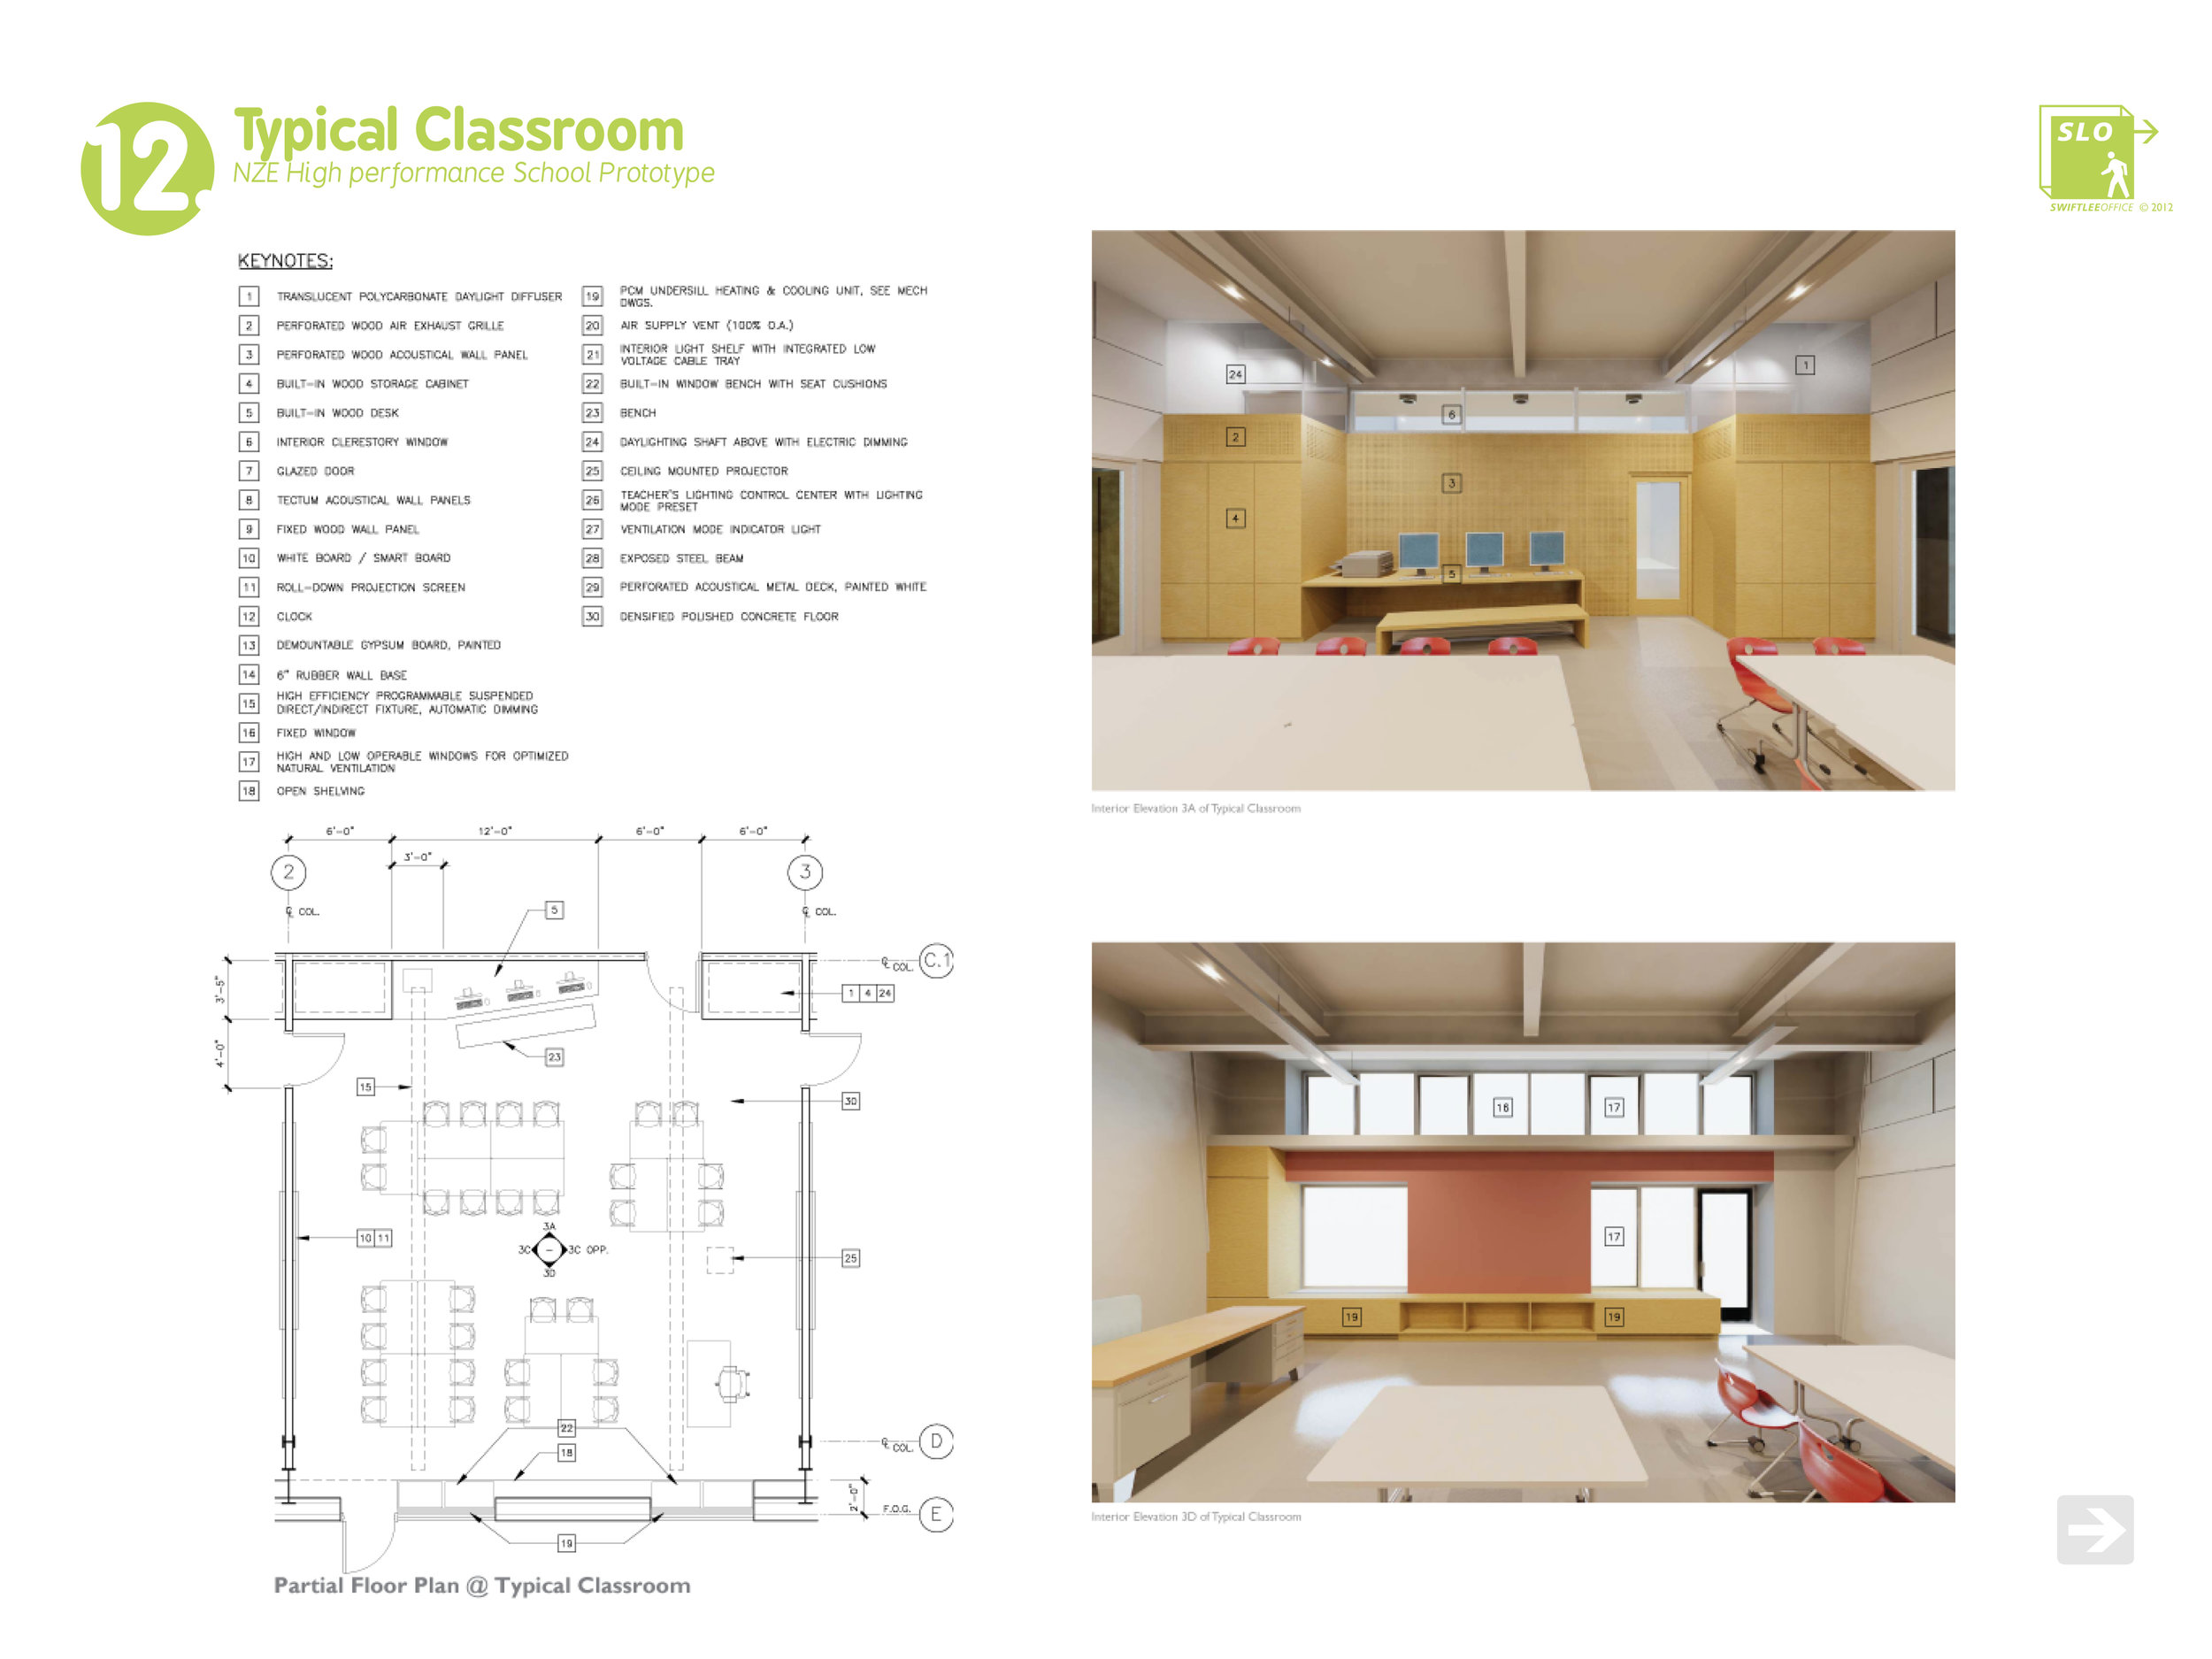 12TypicalClassroom_h.jpg